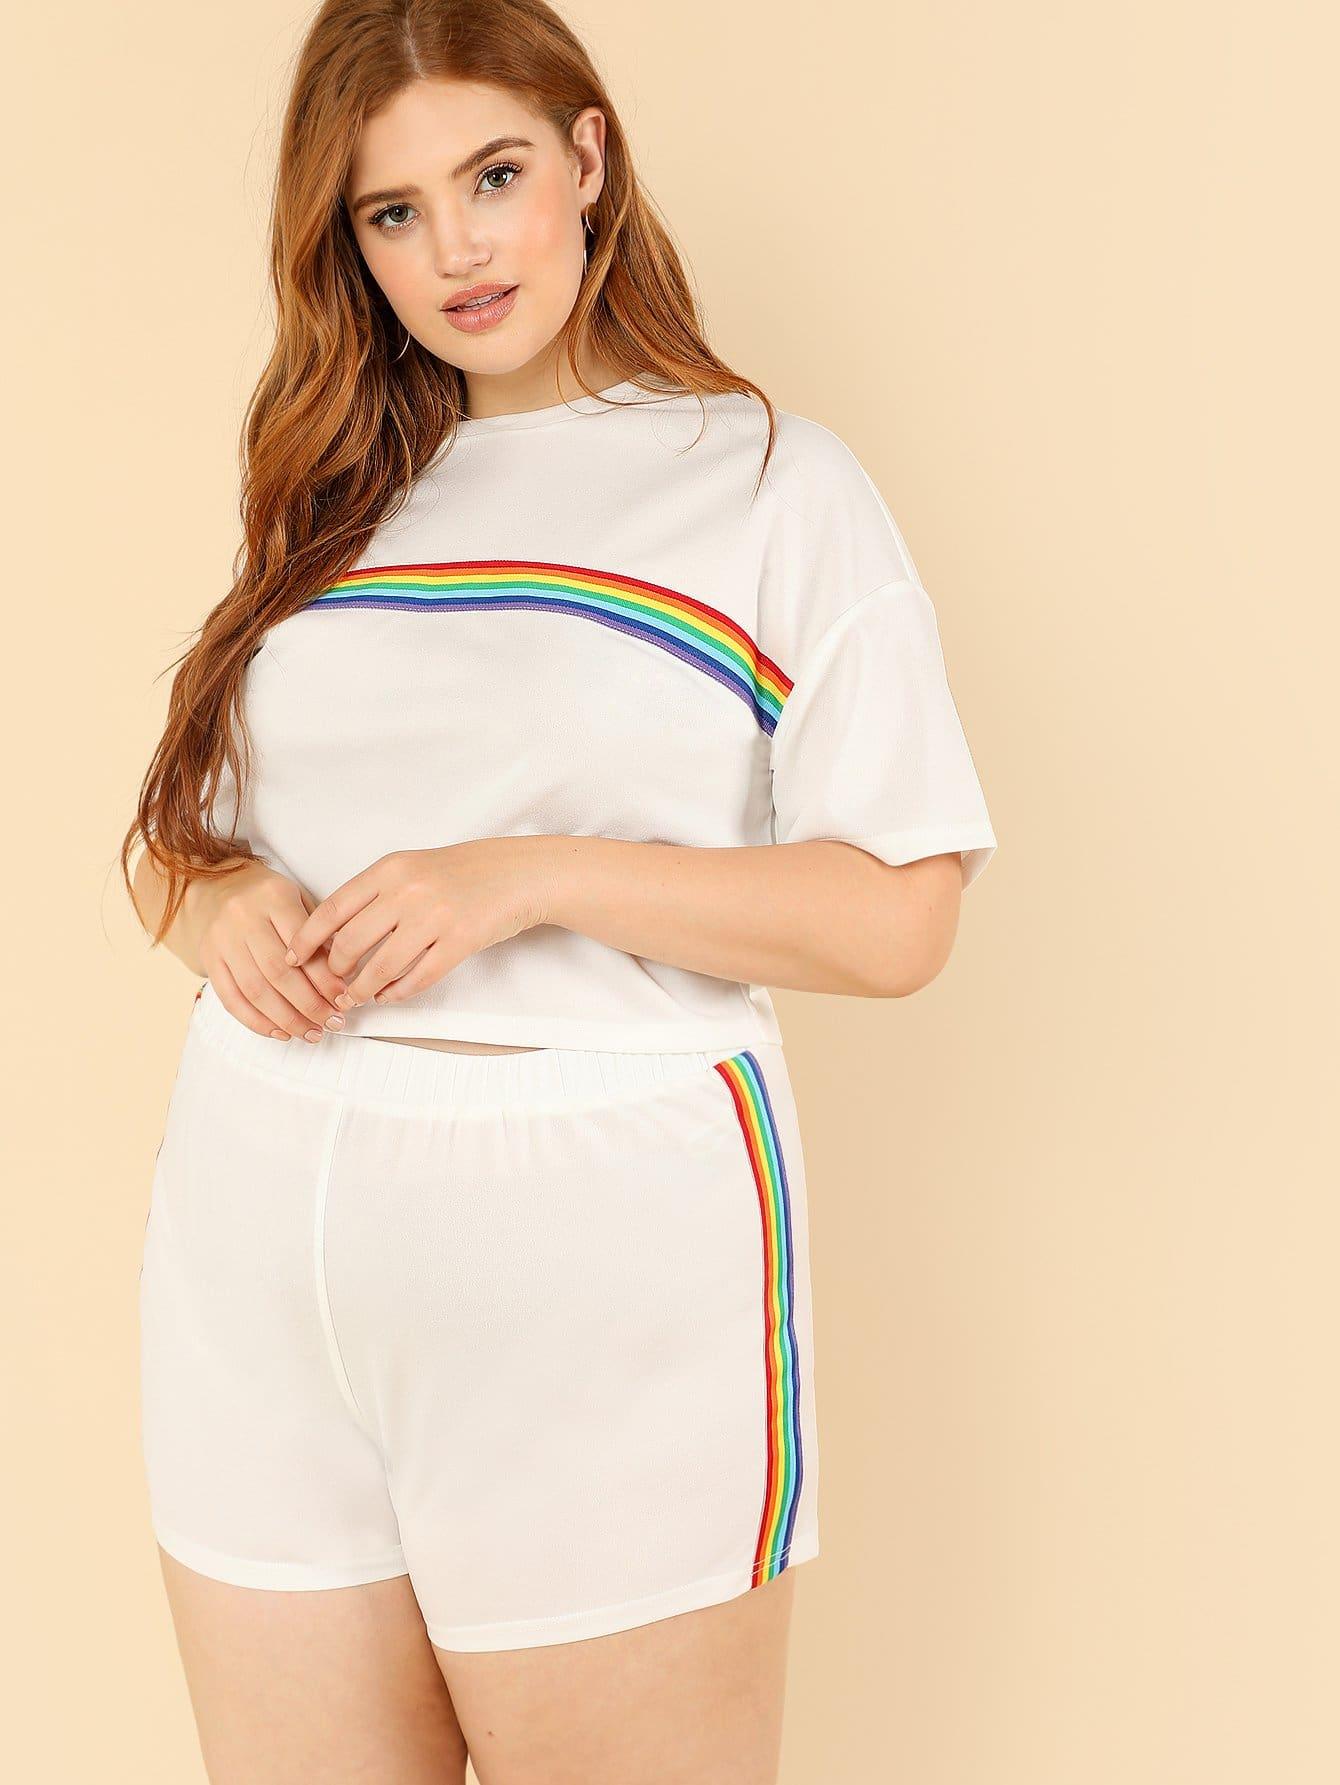 Rainbow Striped Tee & Shorts Set men rainbow striped tee